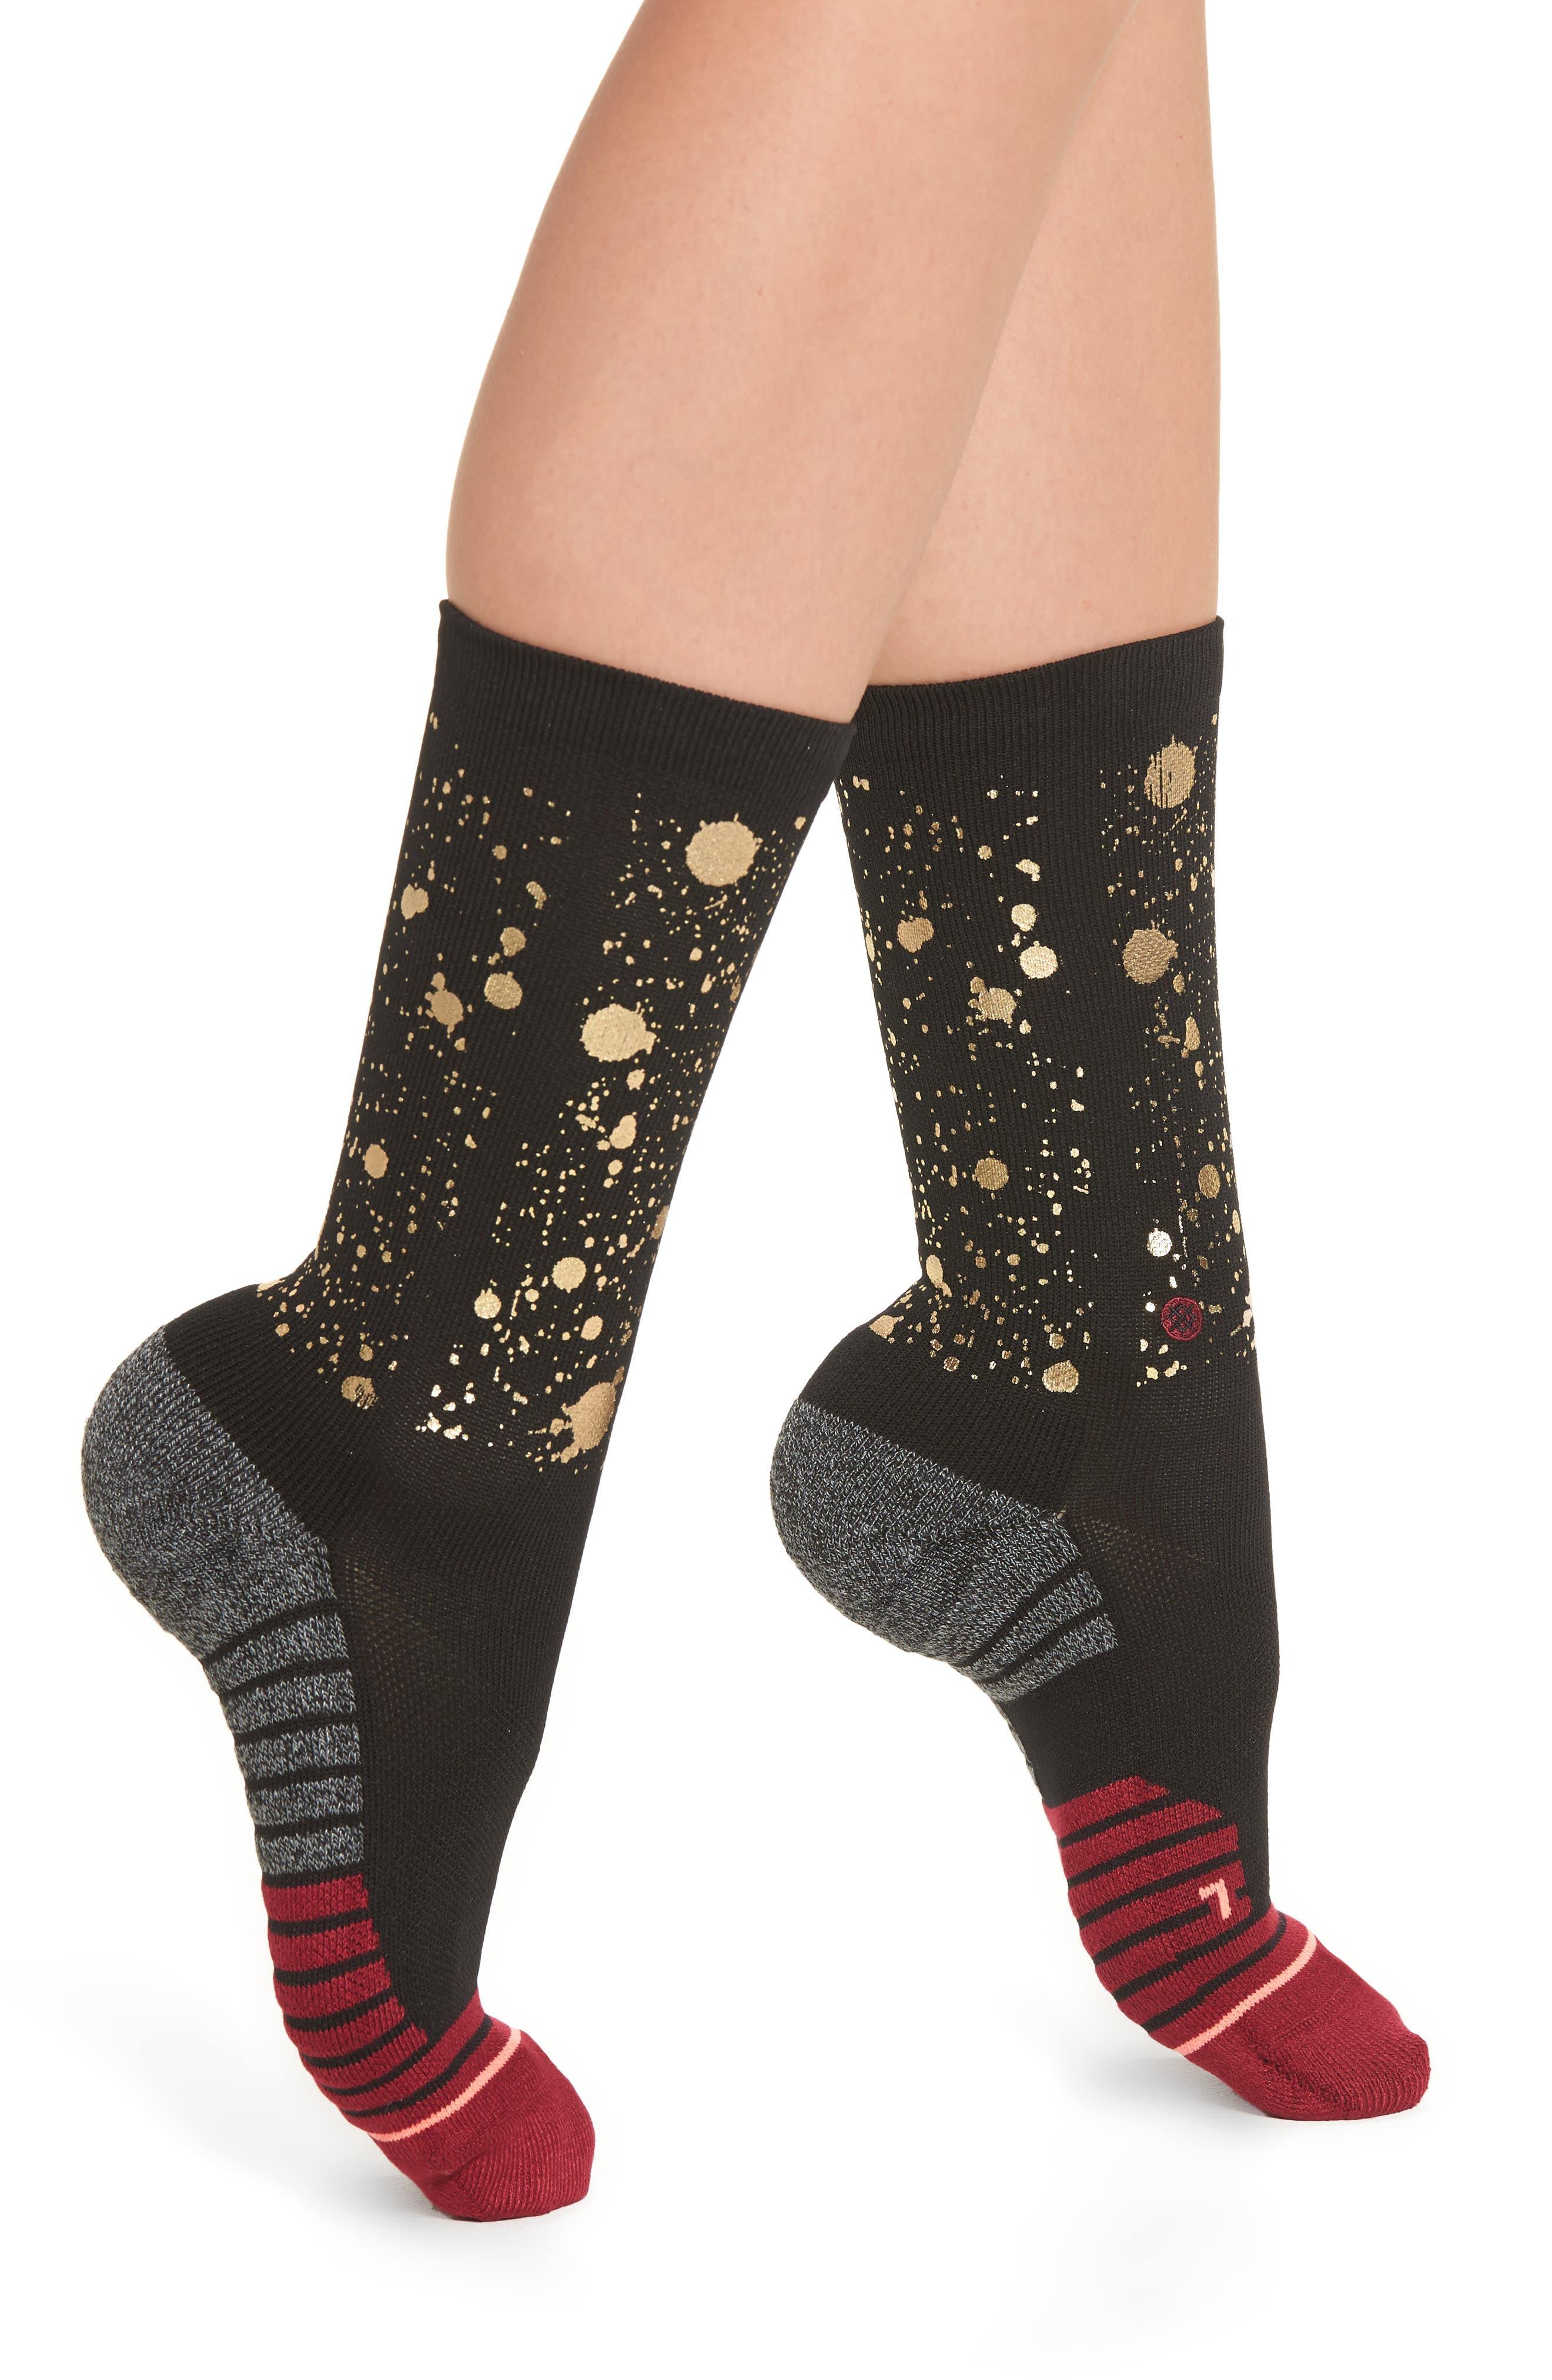 Main Image - Stance Endorphin Training Socks